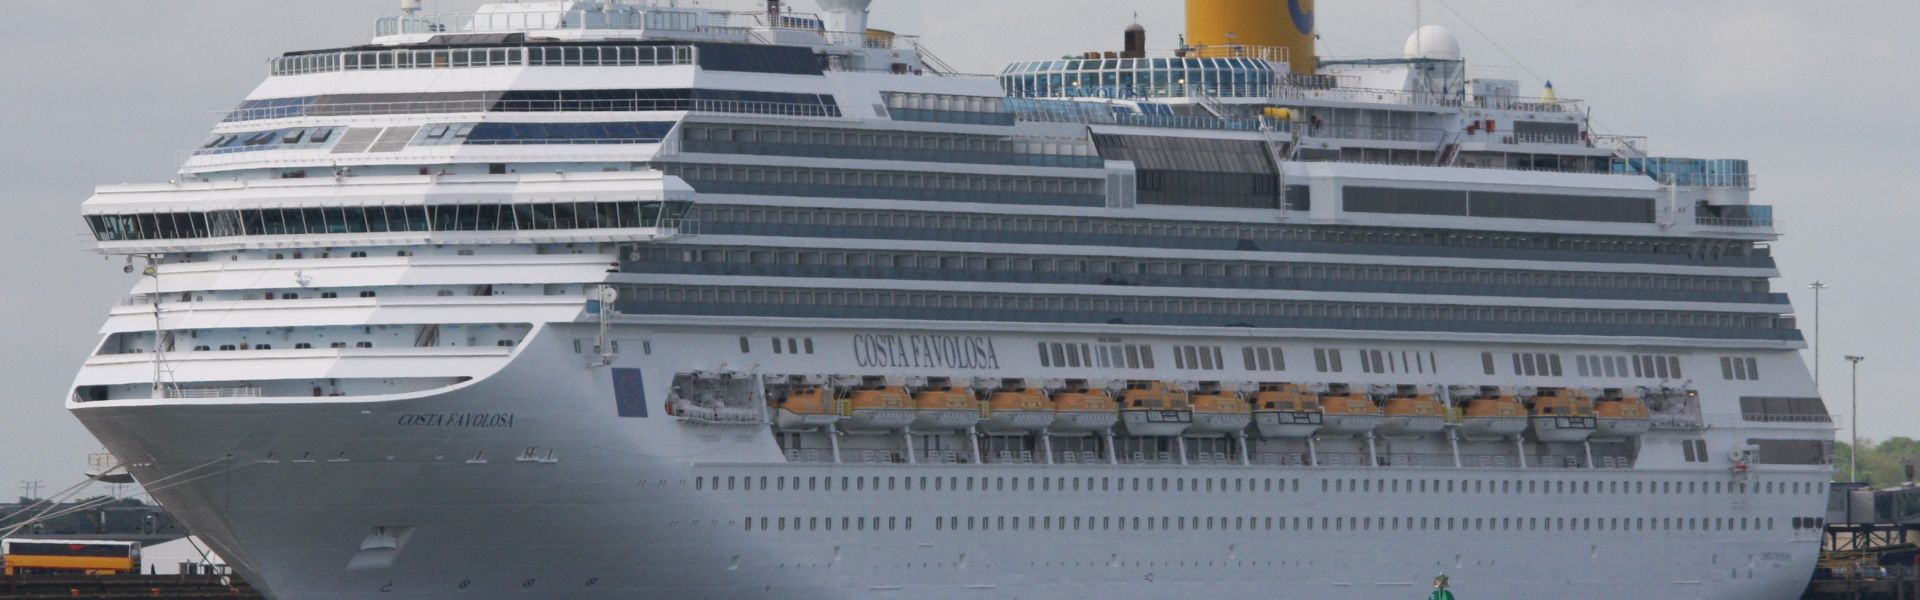 Croaziera 2018 - Mediterana de Vest (Barcelona) - Costa Cruises - Costa Favolosa - 10 nopti